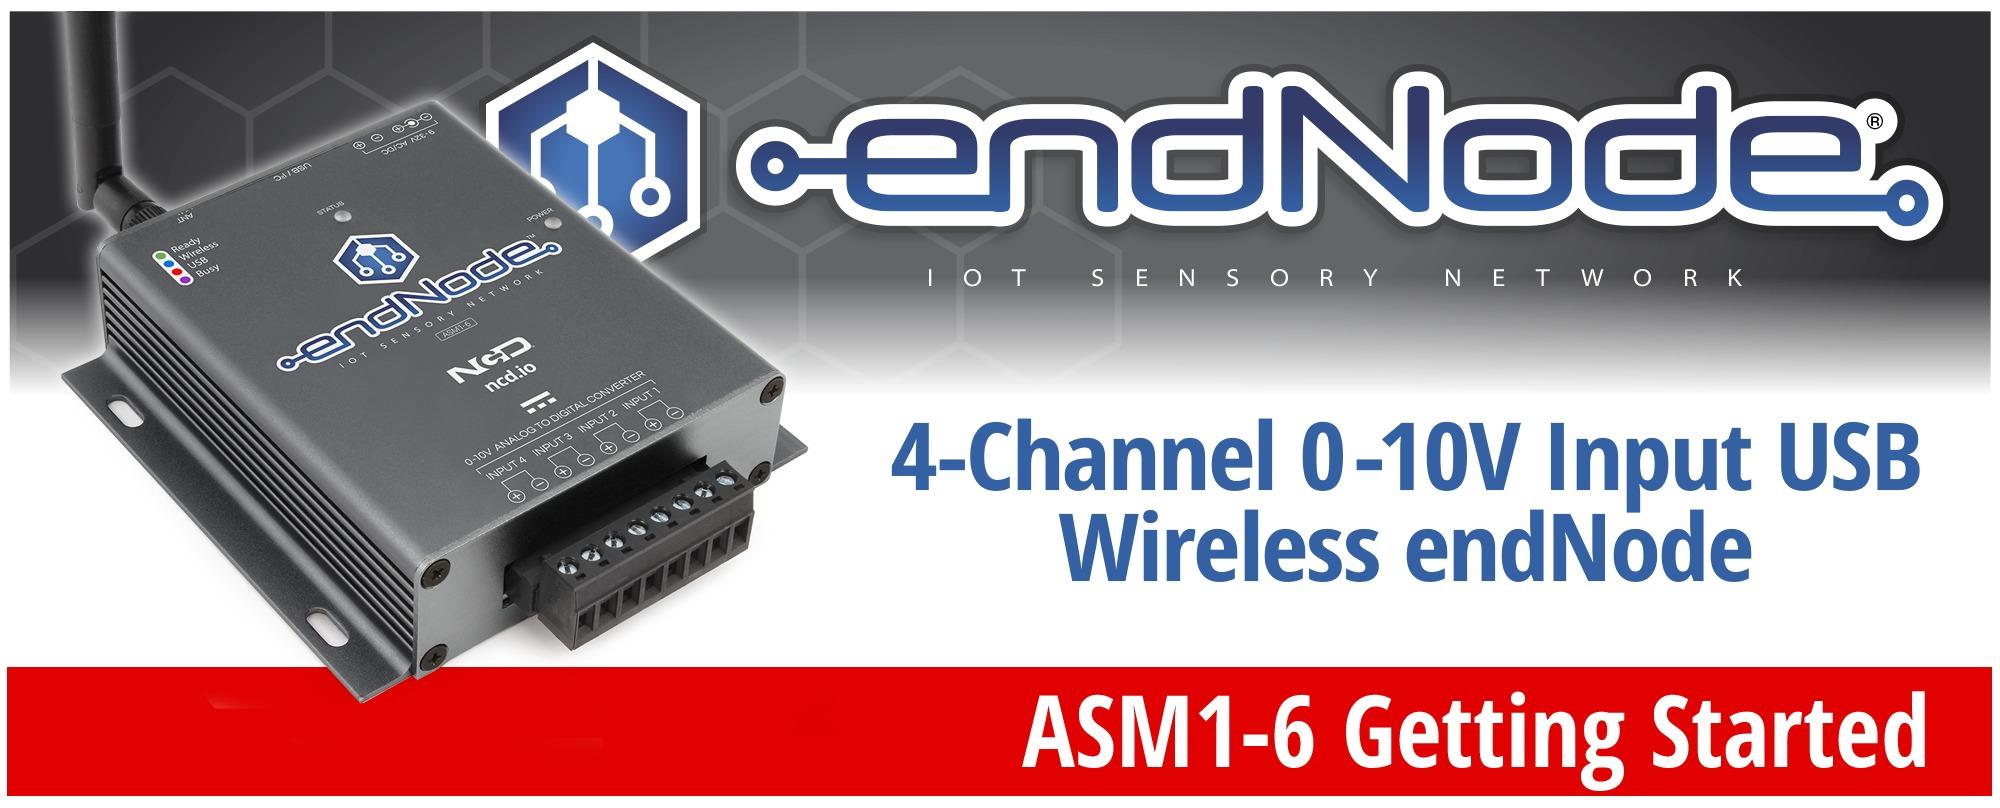 4-Channel 0-10V Input USB Wireless endNode Getting Started